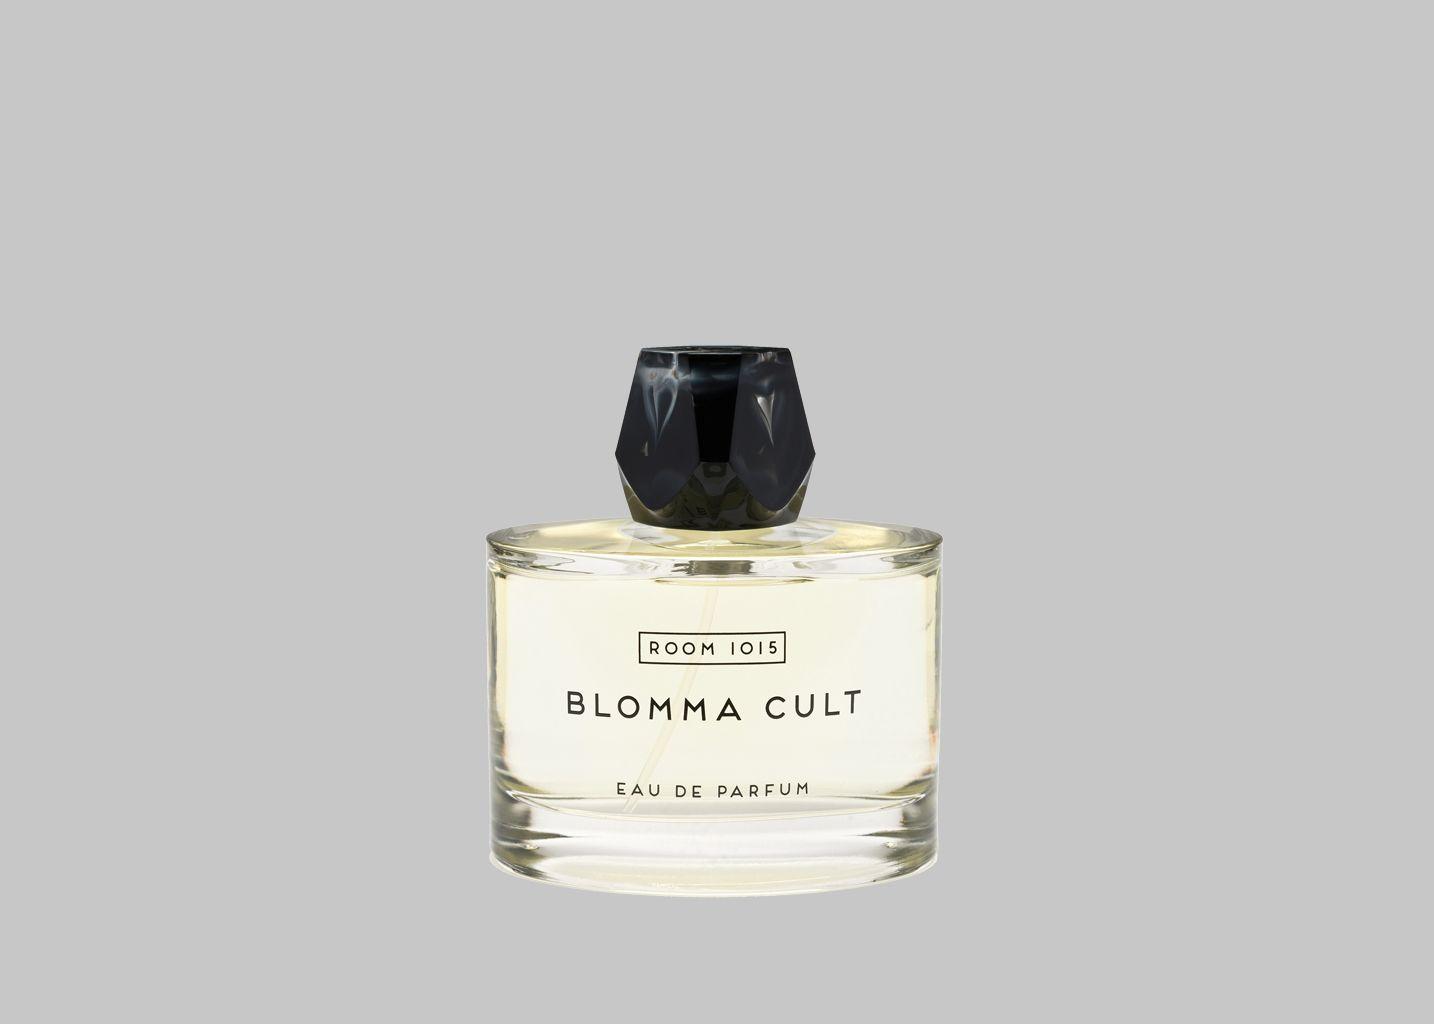 Parfum Blomma Cult - Room 1015